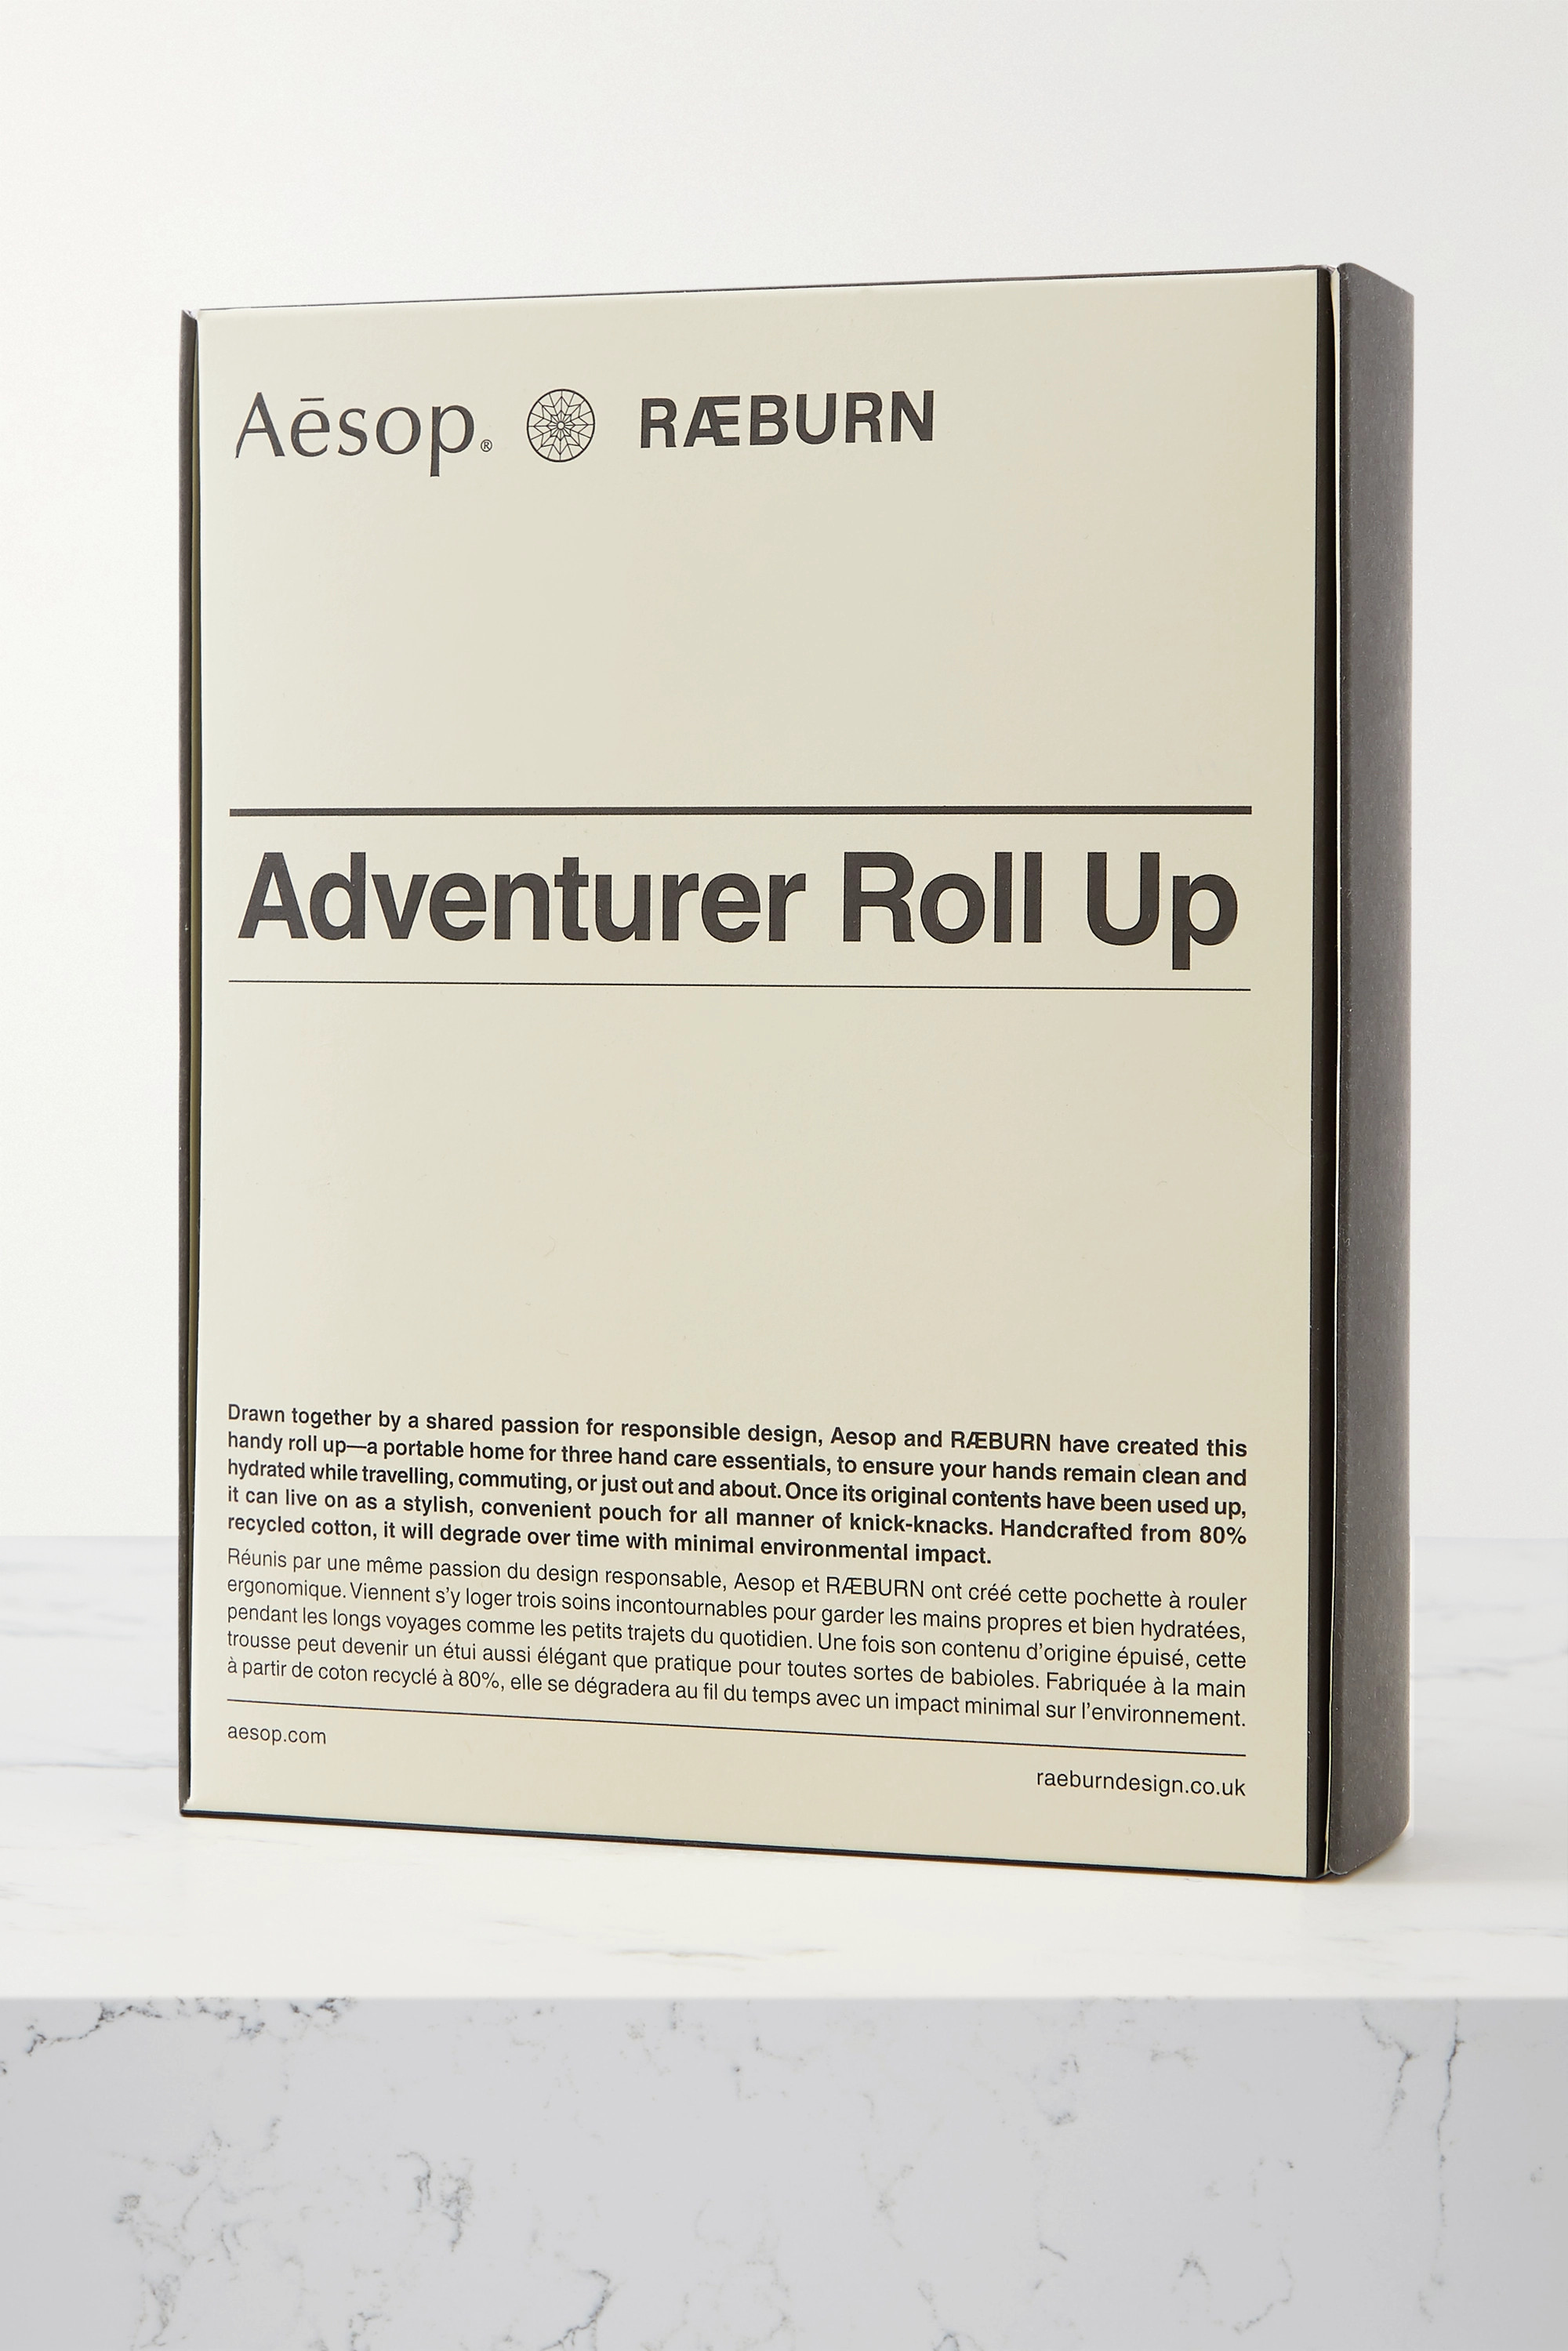 Aesop + RAEBURN Adventurer Roll Up